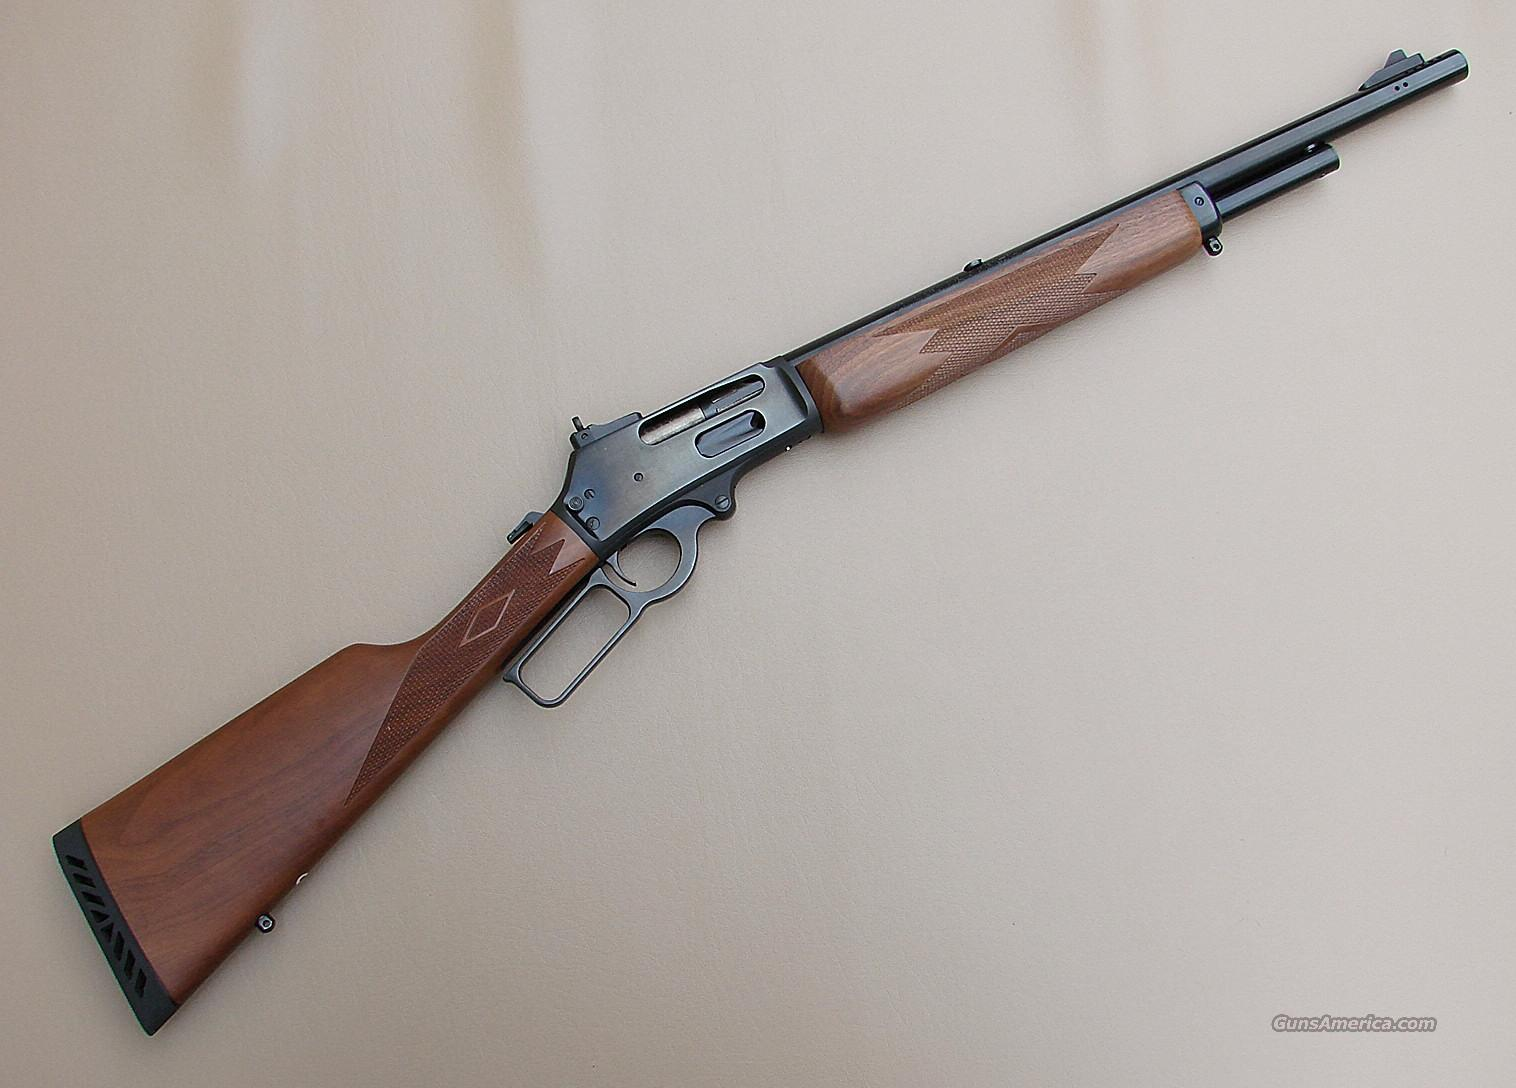 Image result for 450 marlin guide gun